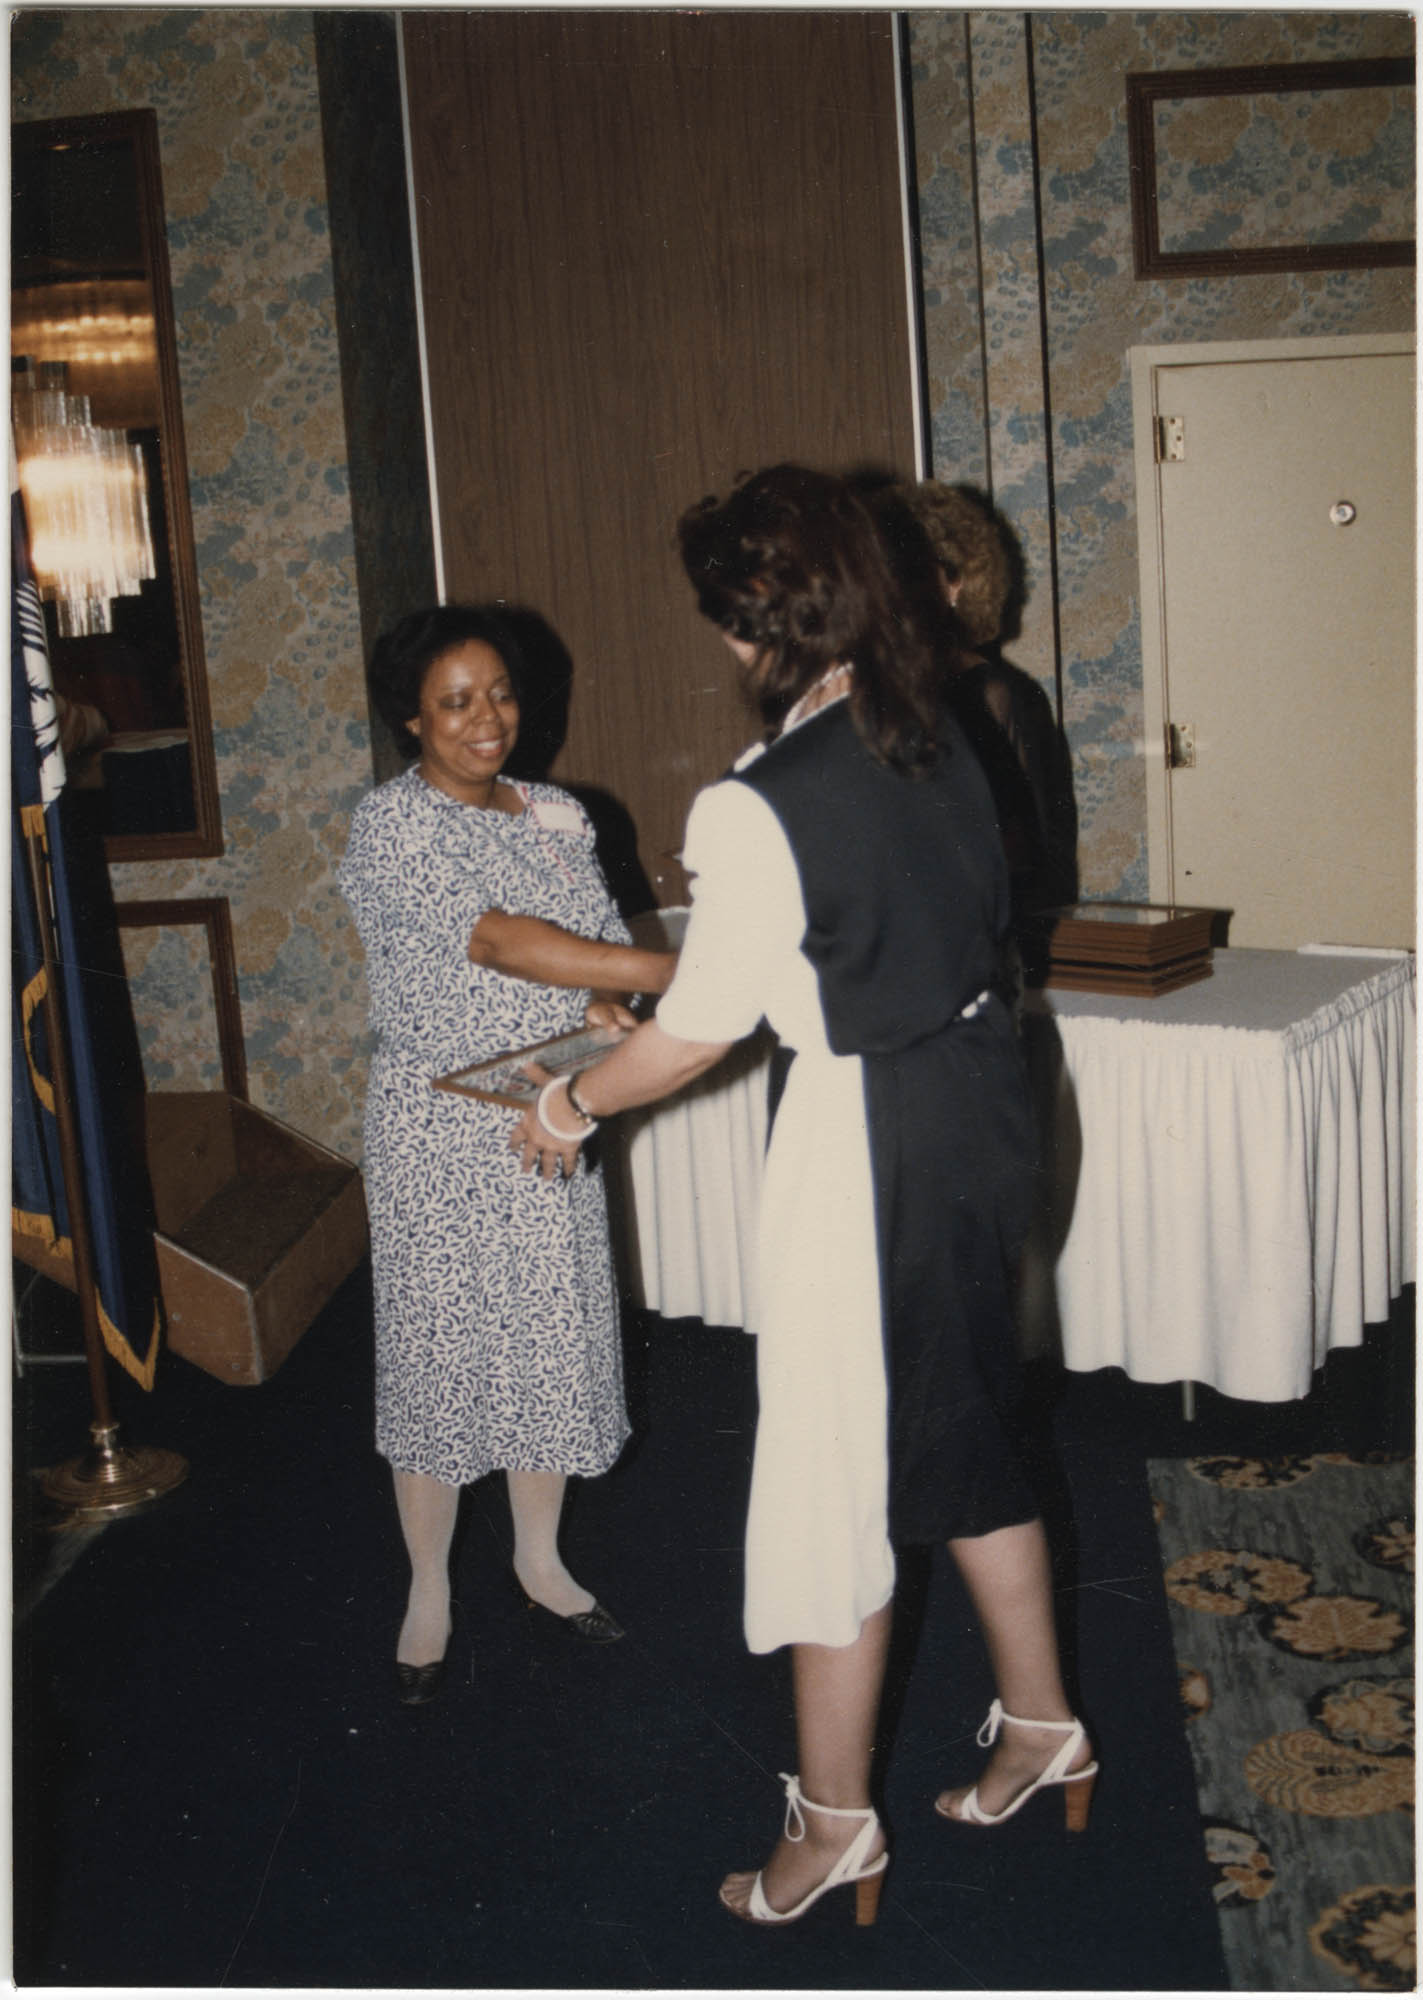 Photograph of a Three Women